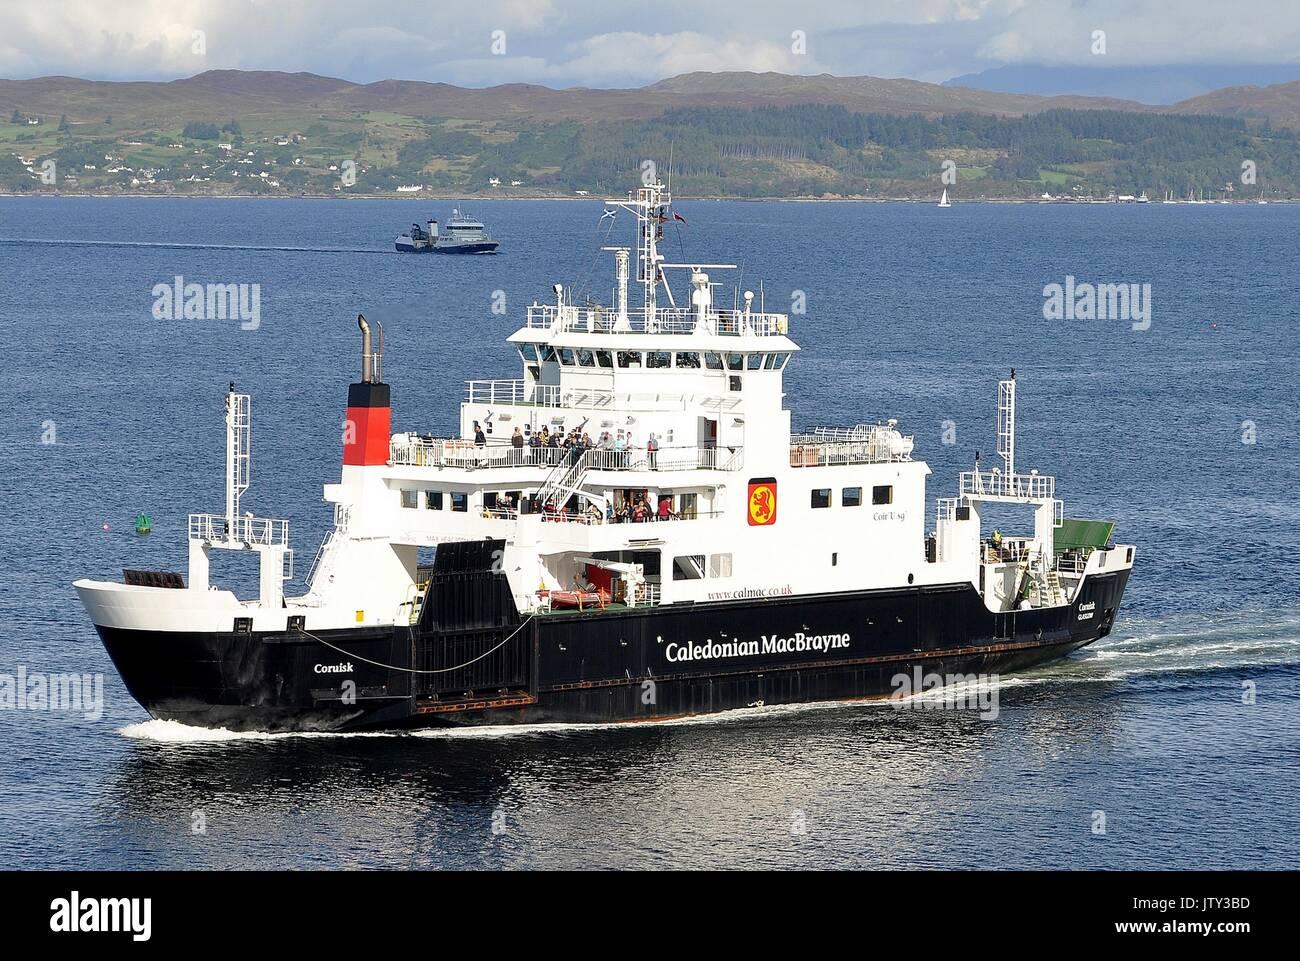 CALEDONIAN MacBRAYNE VEHICLE AND PASSENGER FERRY MV CORUISK Stock Photo